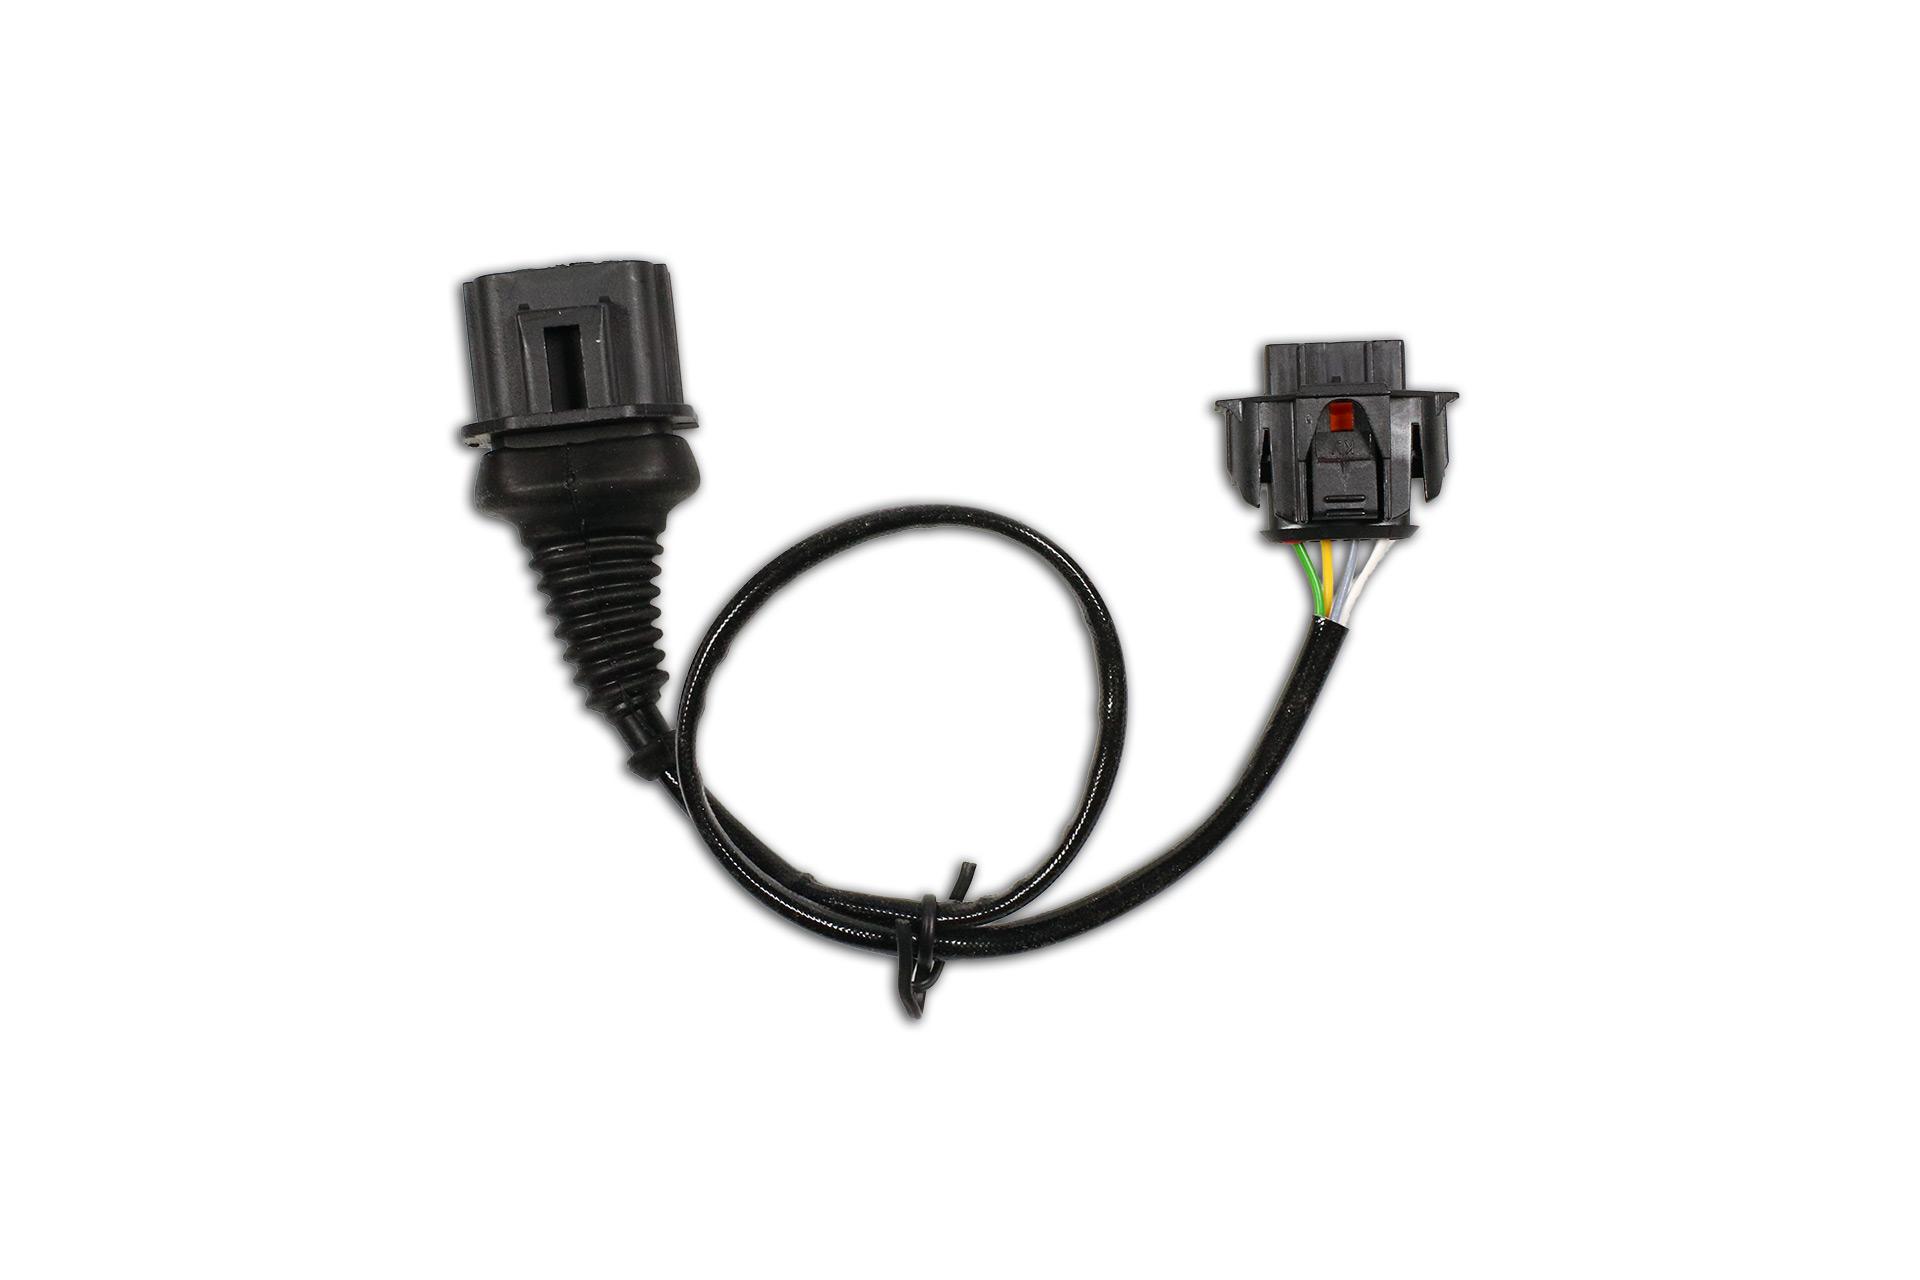 Ford AU BA BF XR6 Turbo MAP Sensor Conversion Loom